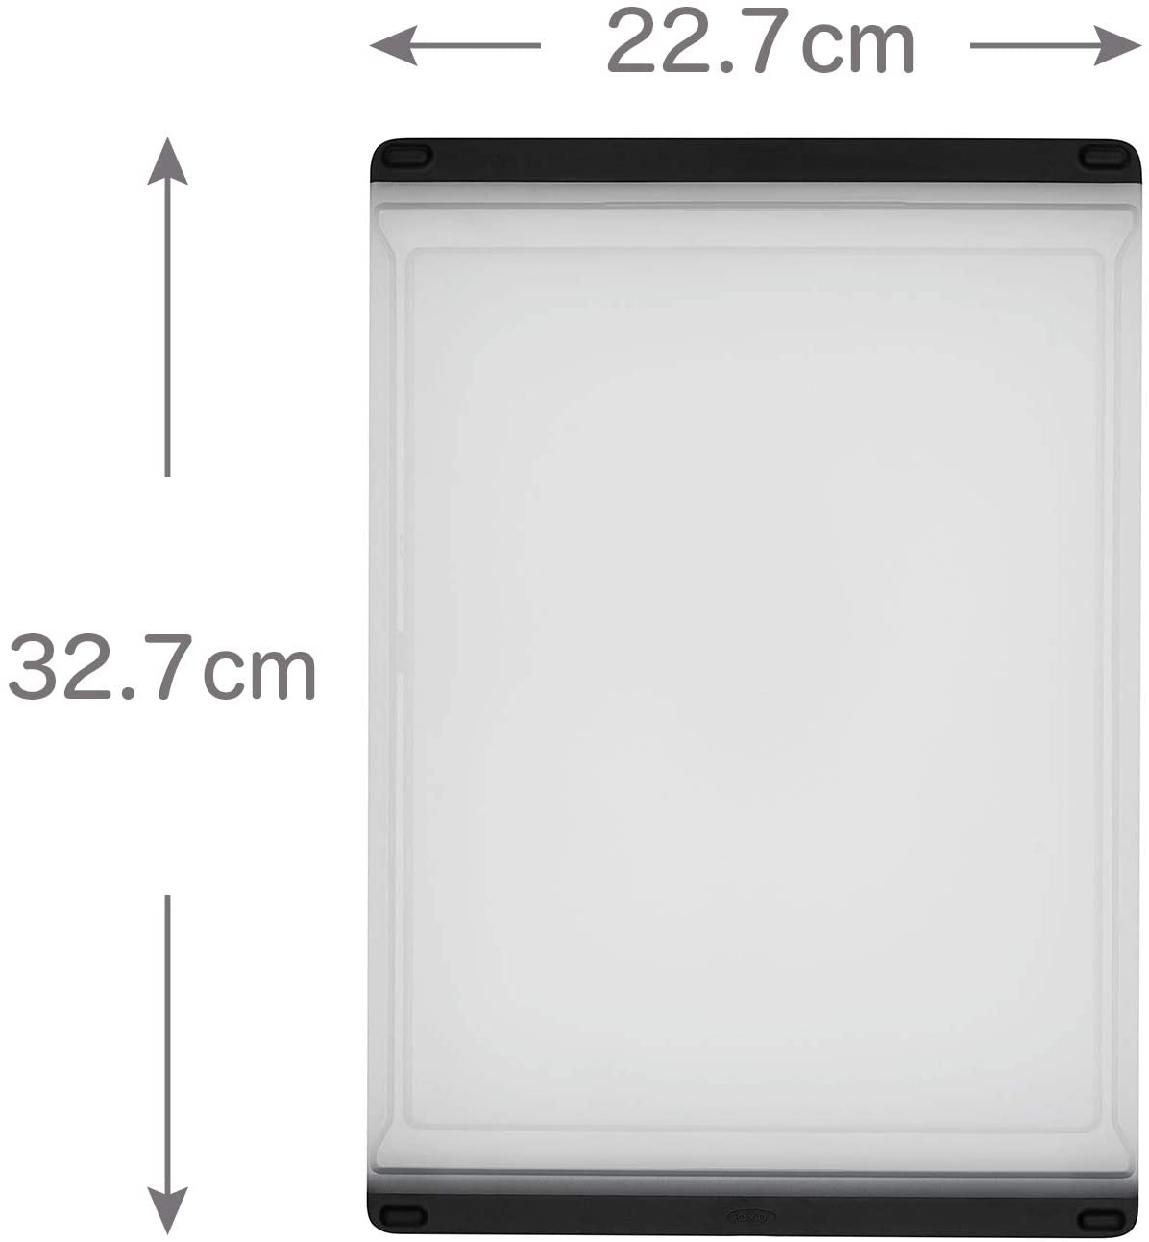 OXO(オクソー)カッティングボードM ホワイト&ブラック 11272700の商品画像3